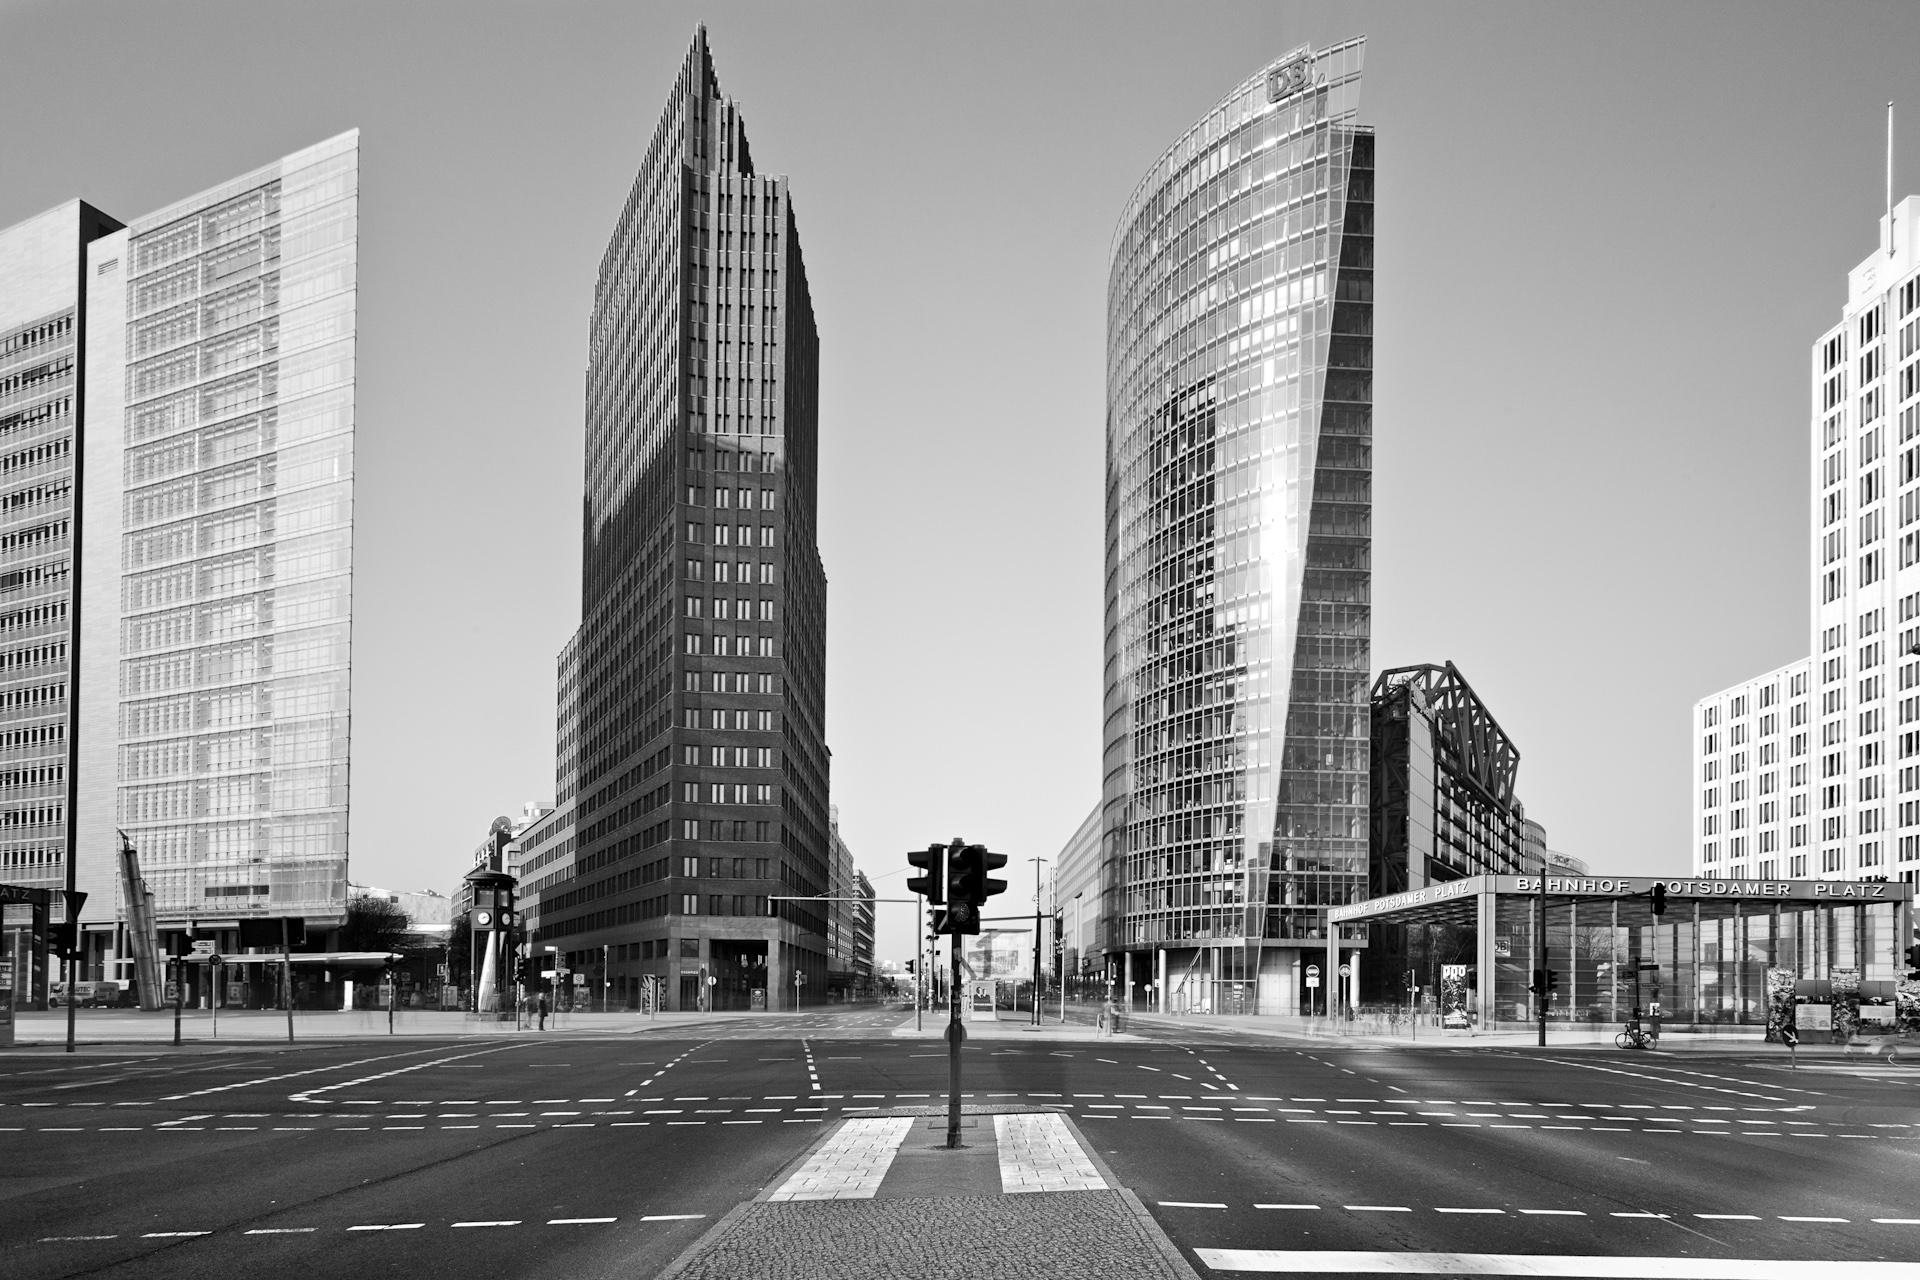 16 Potsdammer Tor